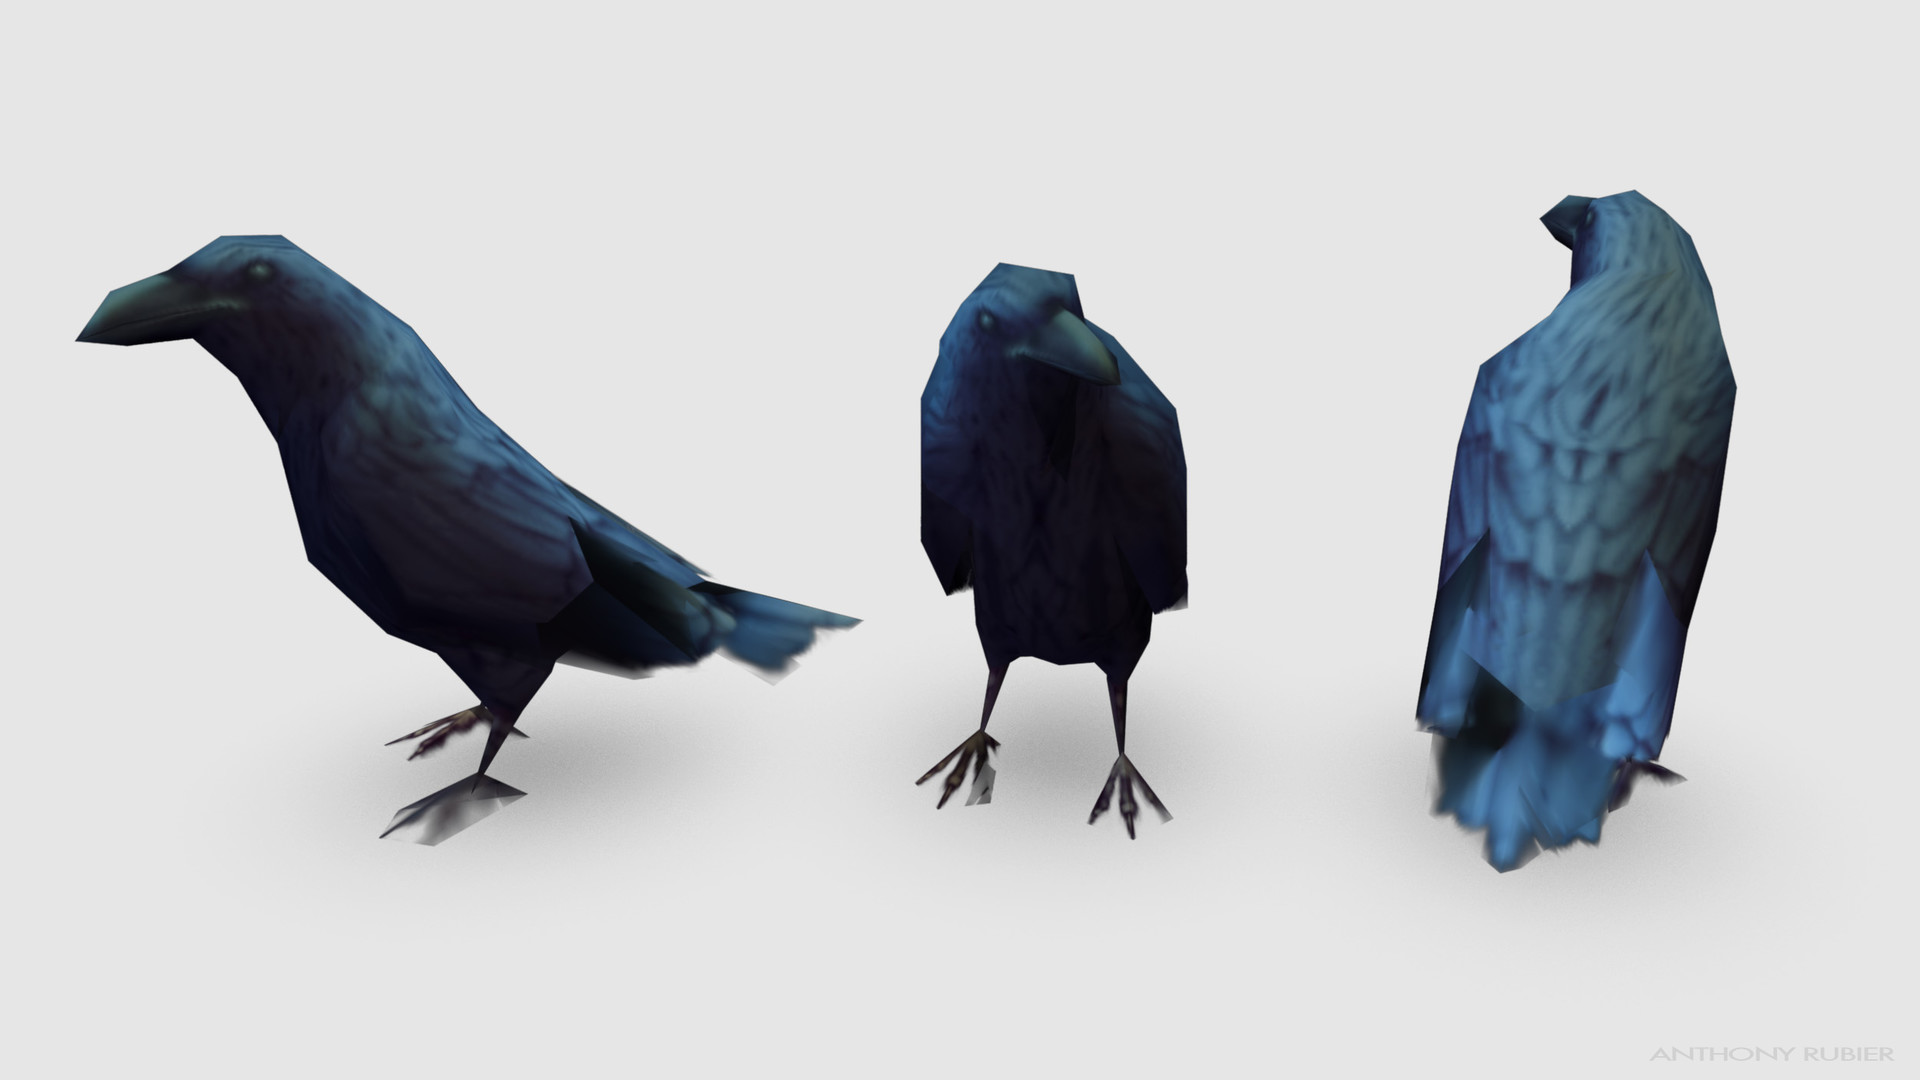 Anthony rubier render mesh corbeau 1